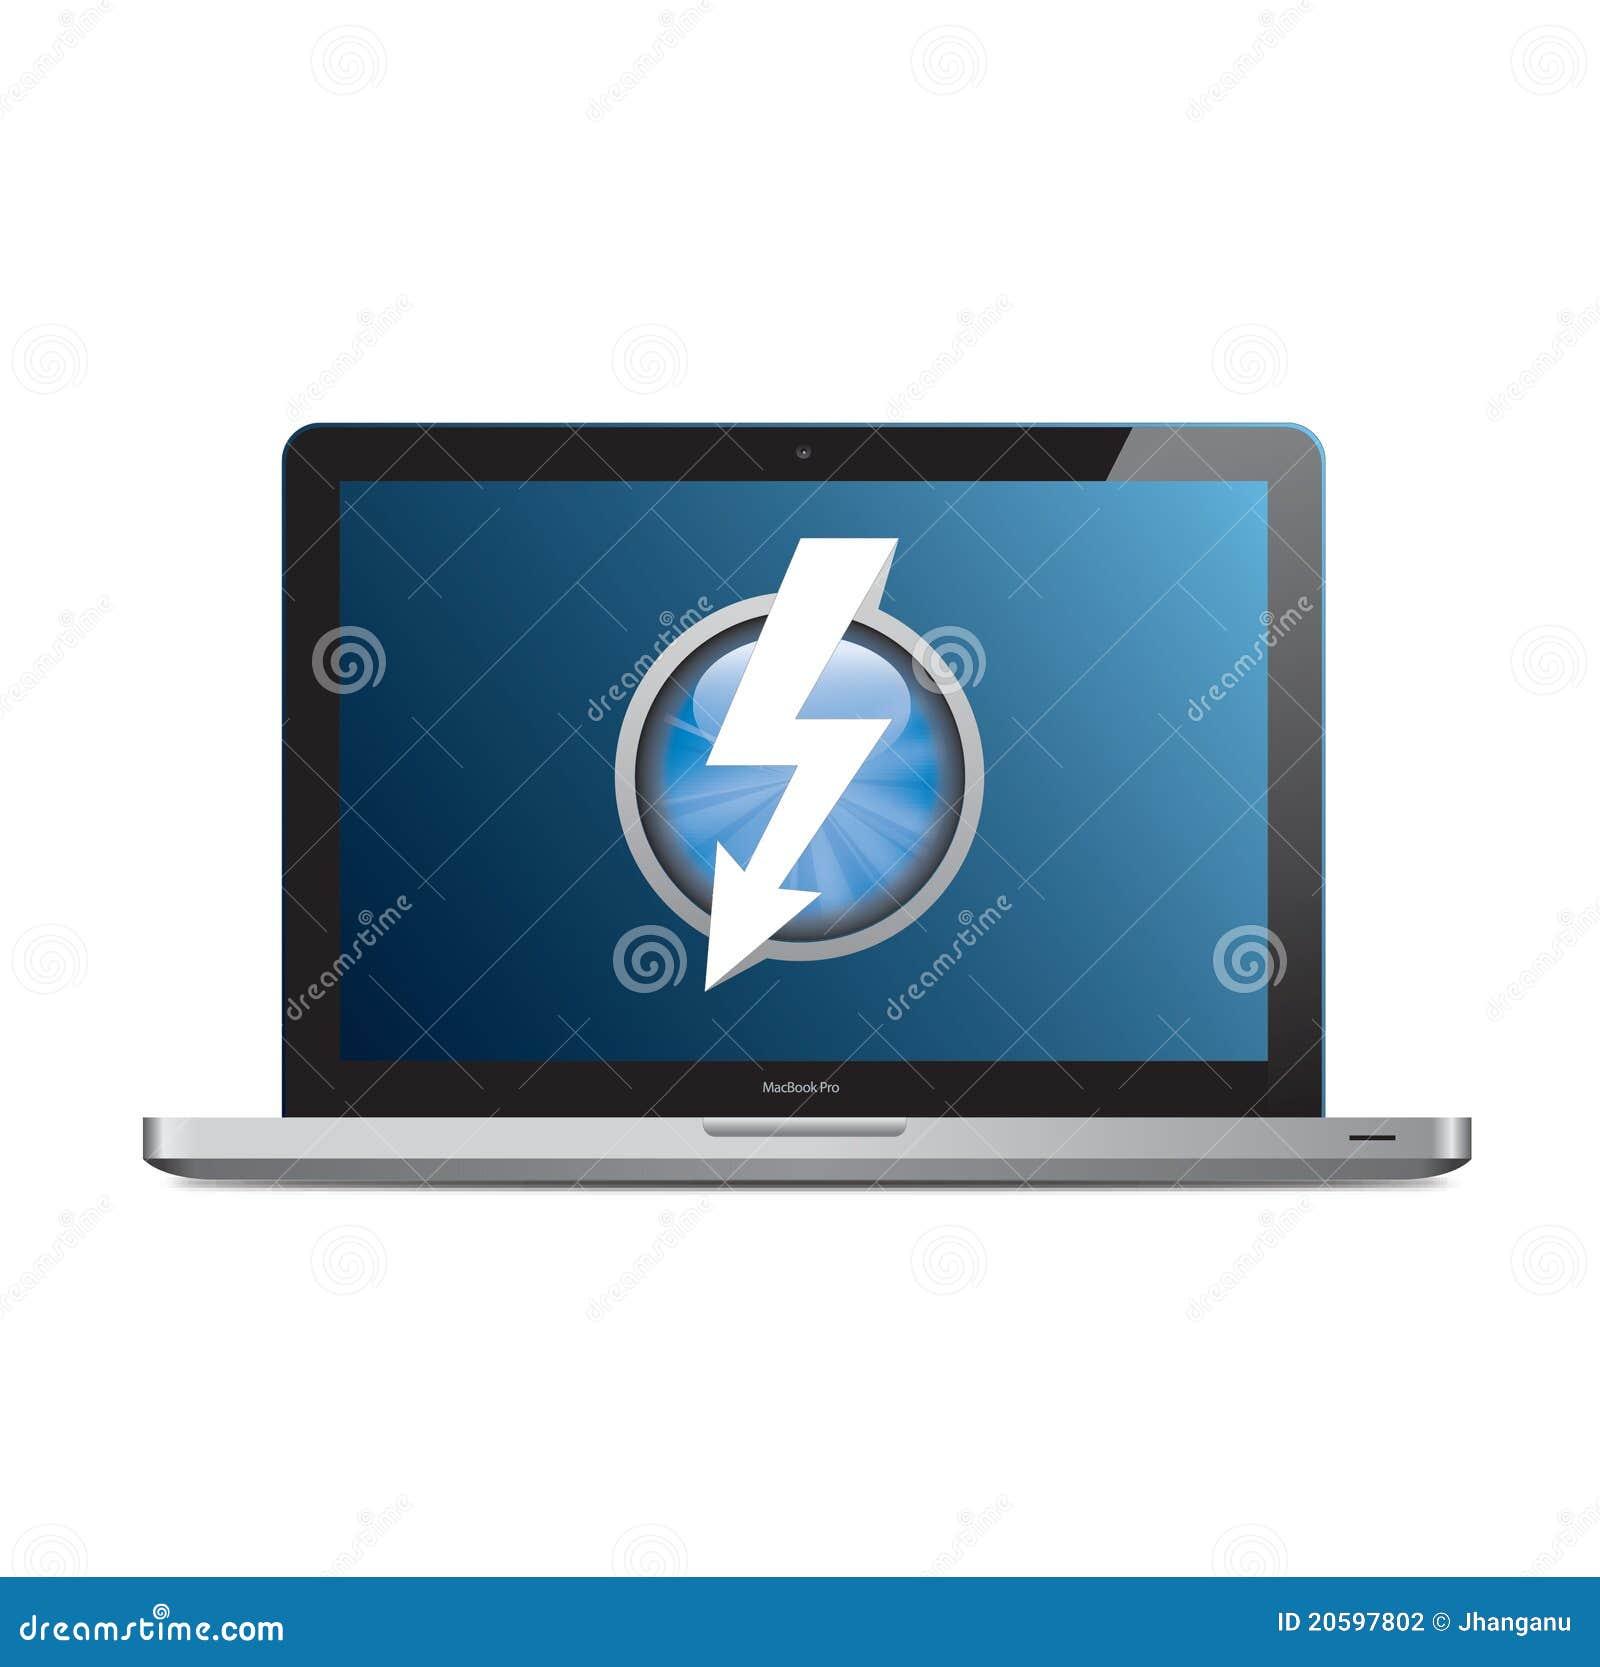 Apple MacBook Pro with Thunderbolt logo on screen